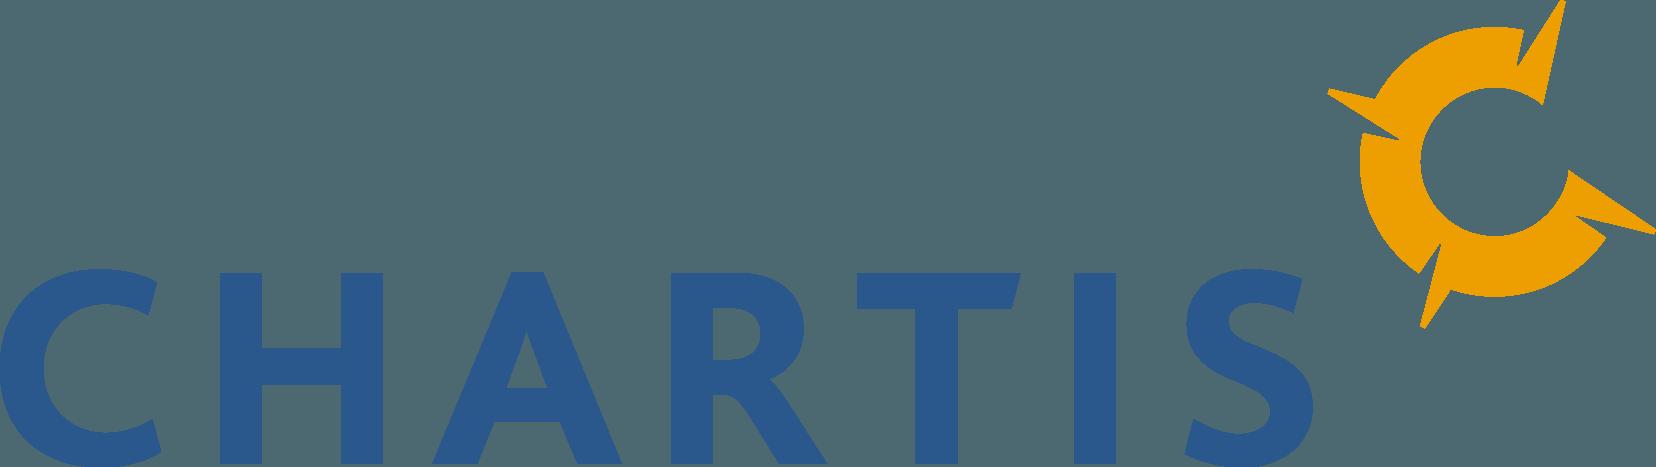 Chartis Insurance Logo png